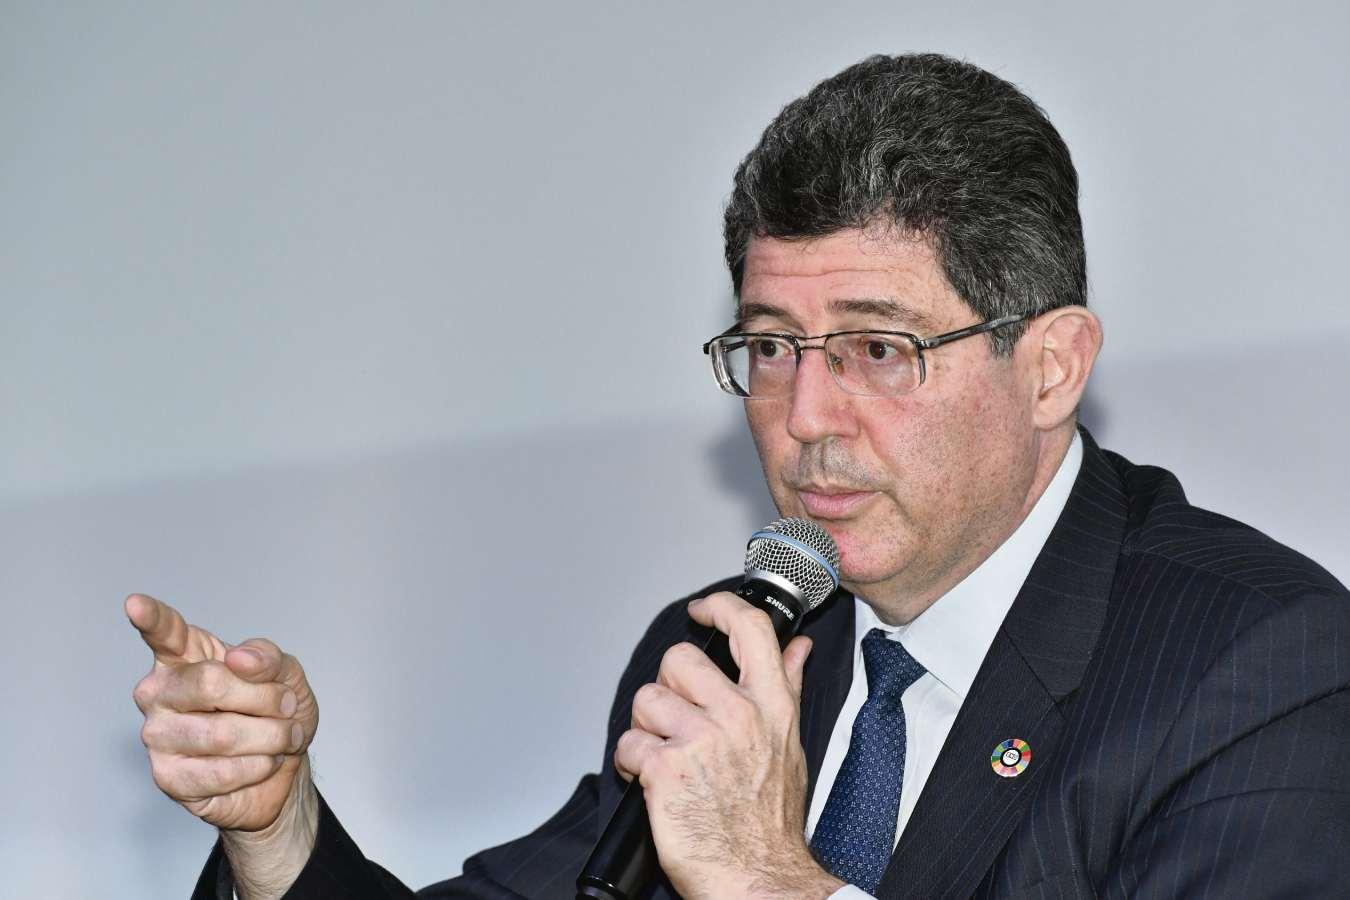 O presidente do Banco Nacional do Desenvolvimento Econômico e Social (BNDES), Joaquim Levy. Crédito: Edson Chagas